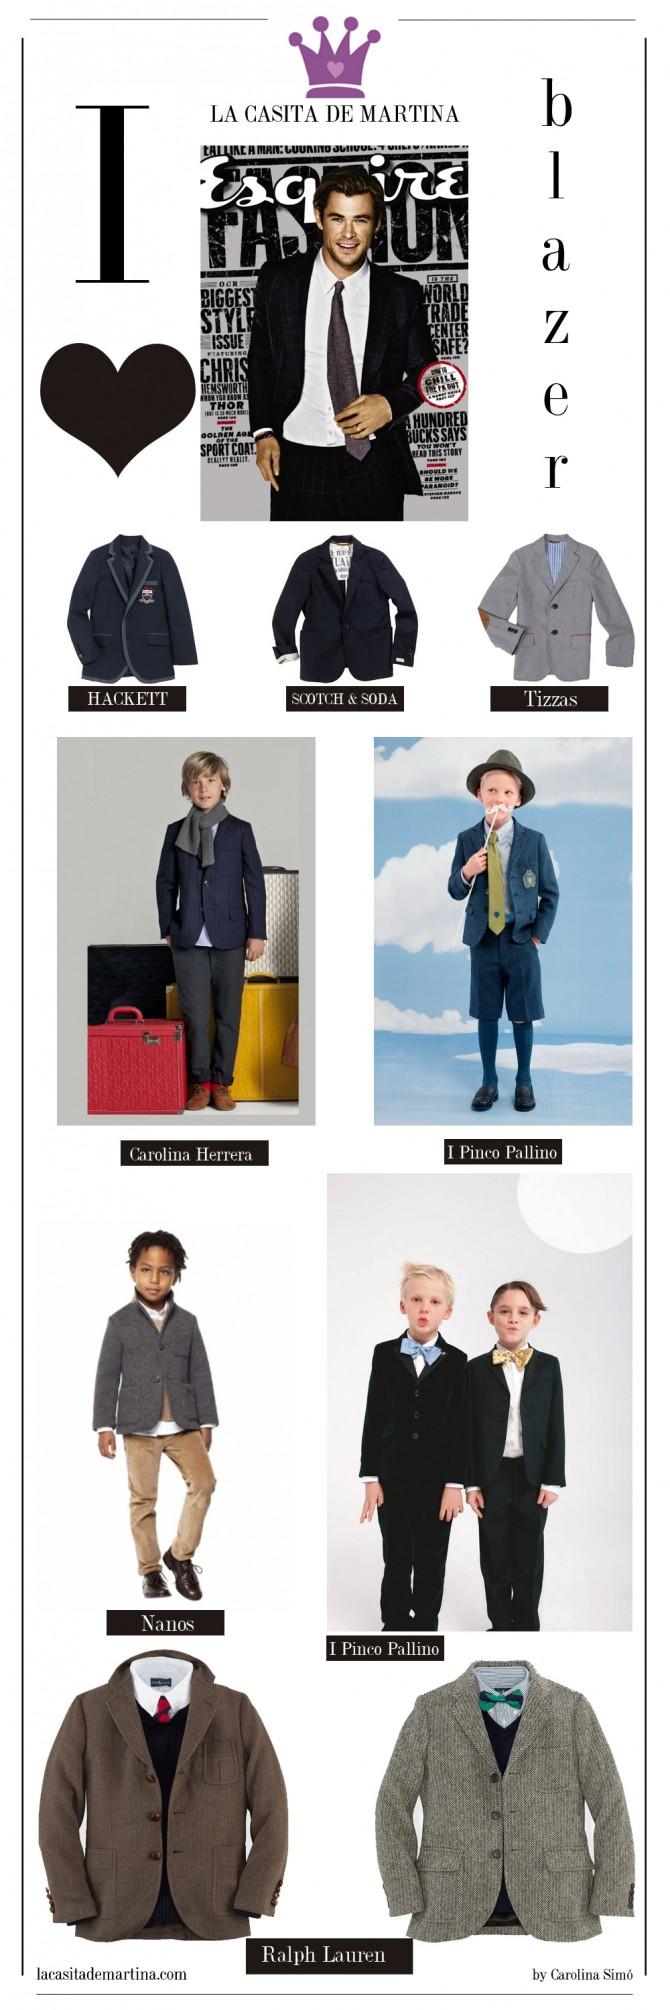 Tendencias Moda Infantil, Blog Moda Infantil,  La casita de Martina, moda niños